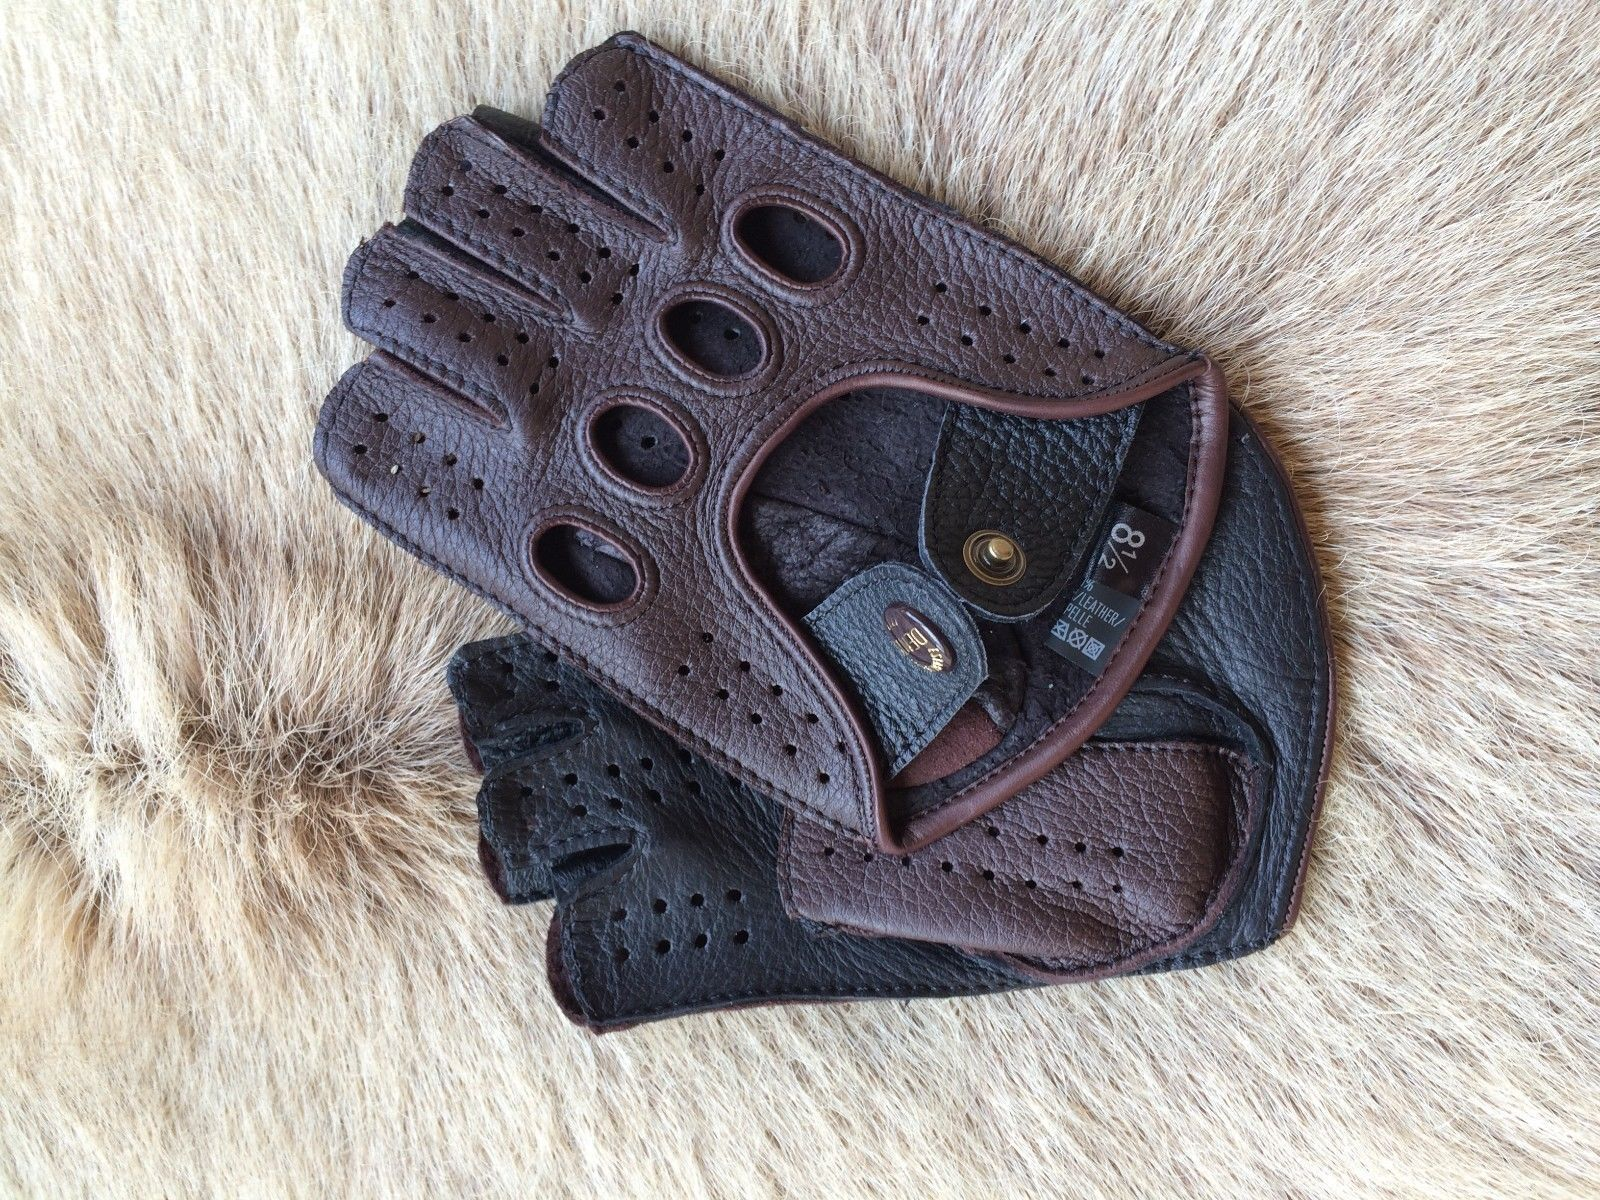 Driving Gloves Deerskin Fingerless Leather Brown Black Half finger Men's Gloves